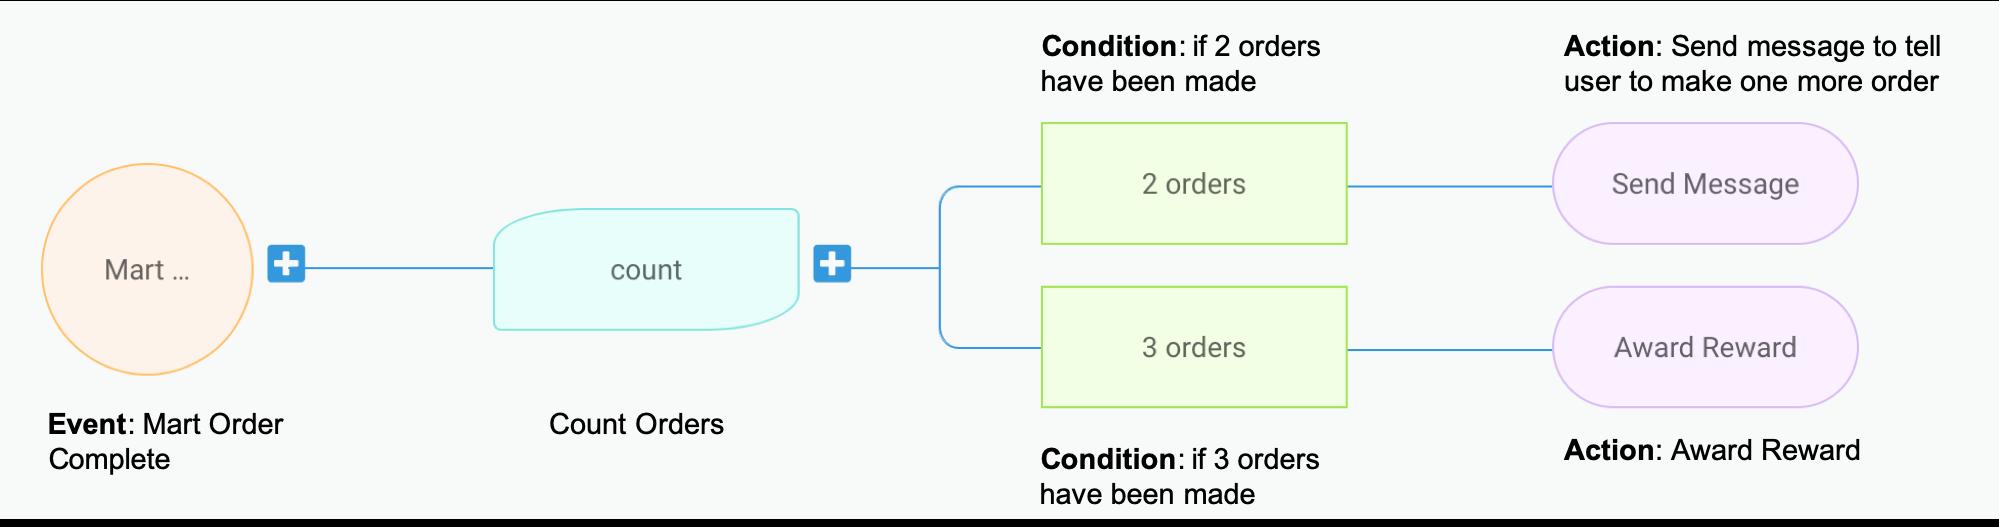 Trident process flow